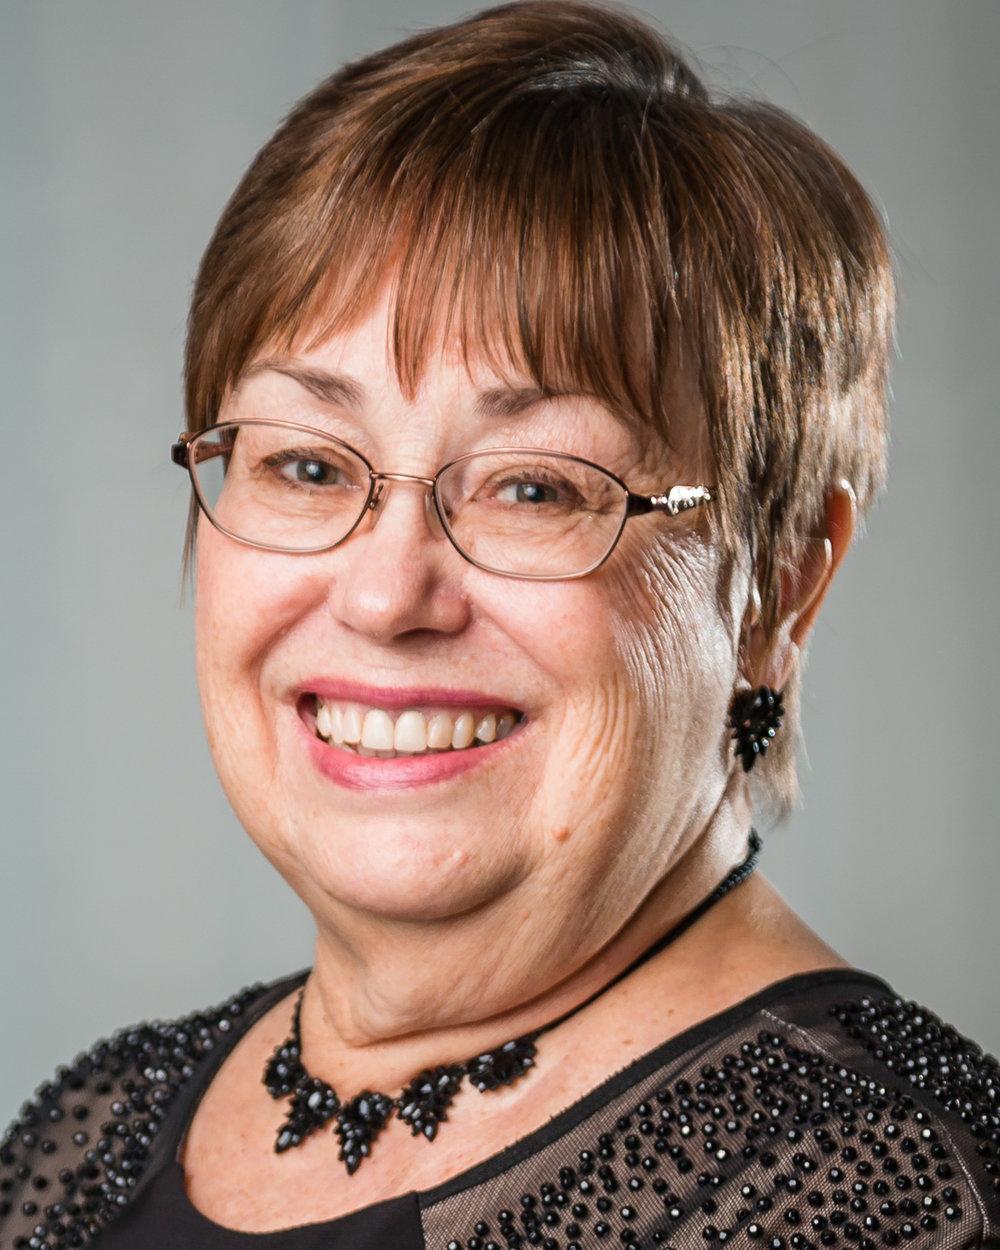 Sail Captain - Kathy Gager